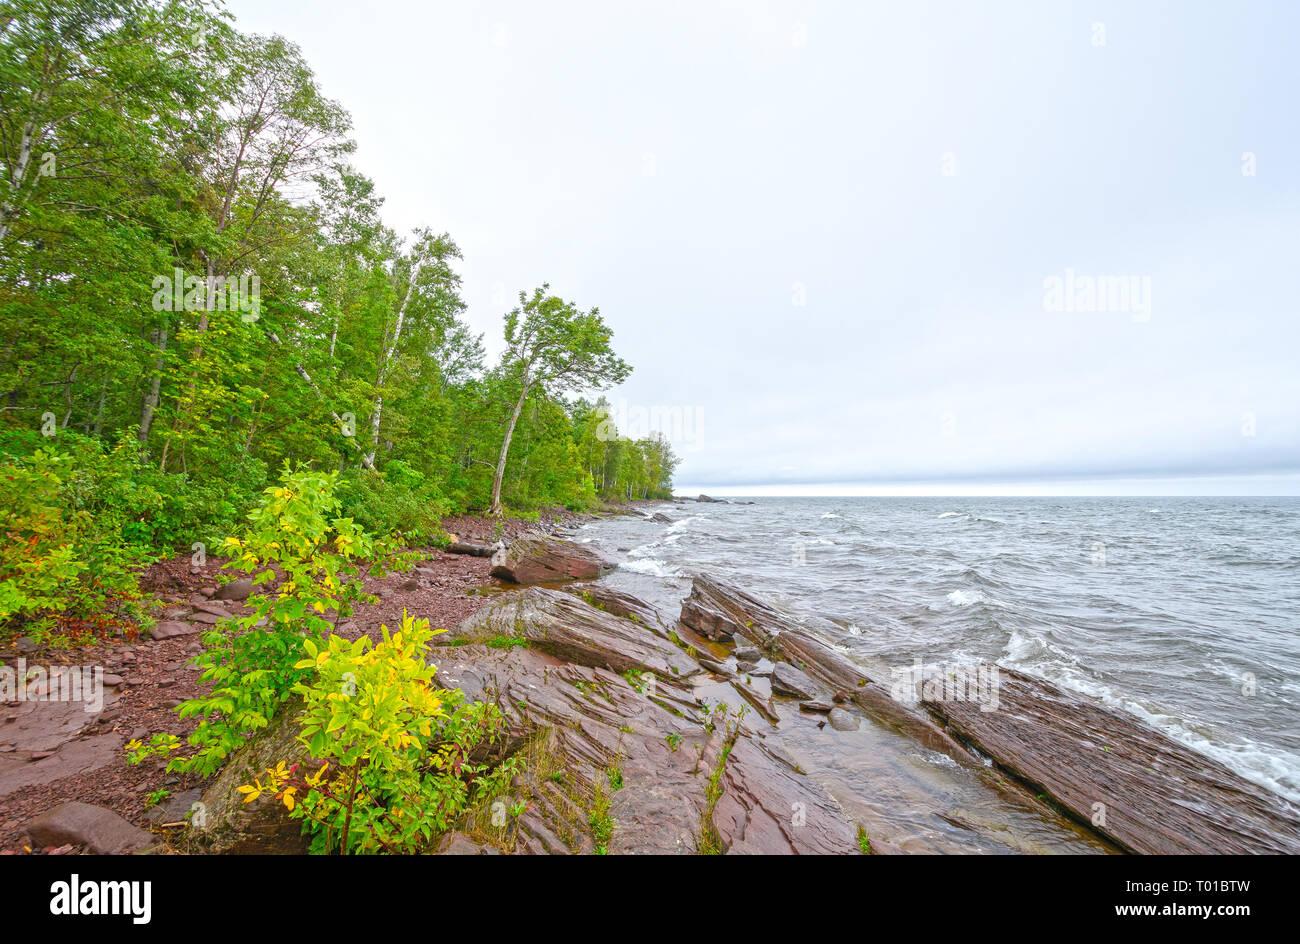 Waves Crashing Lake Superior Stock Photos & Waves Crashing